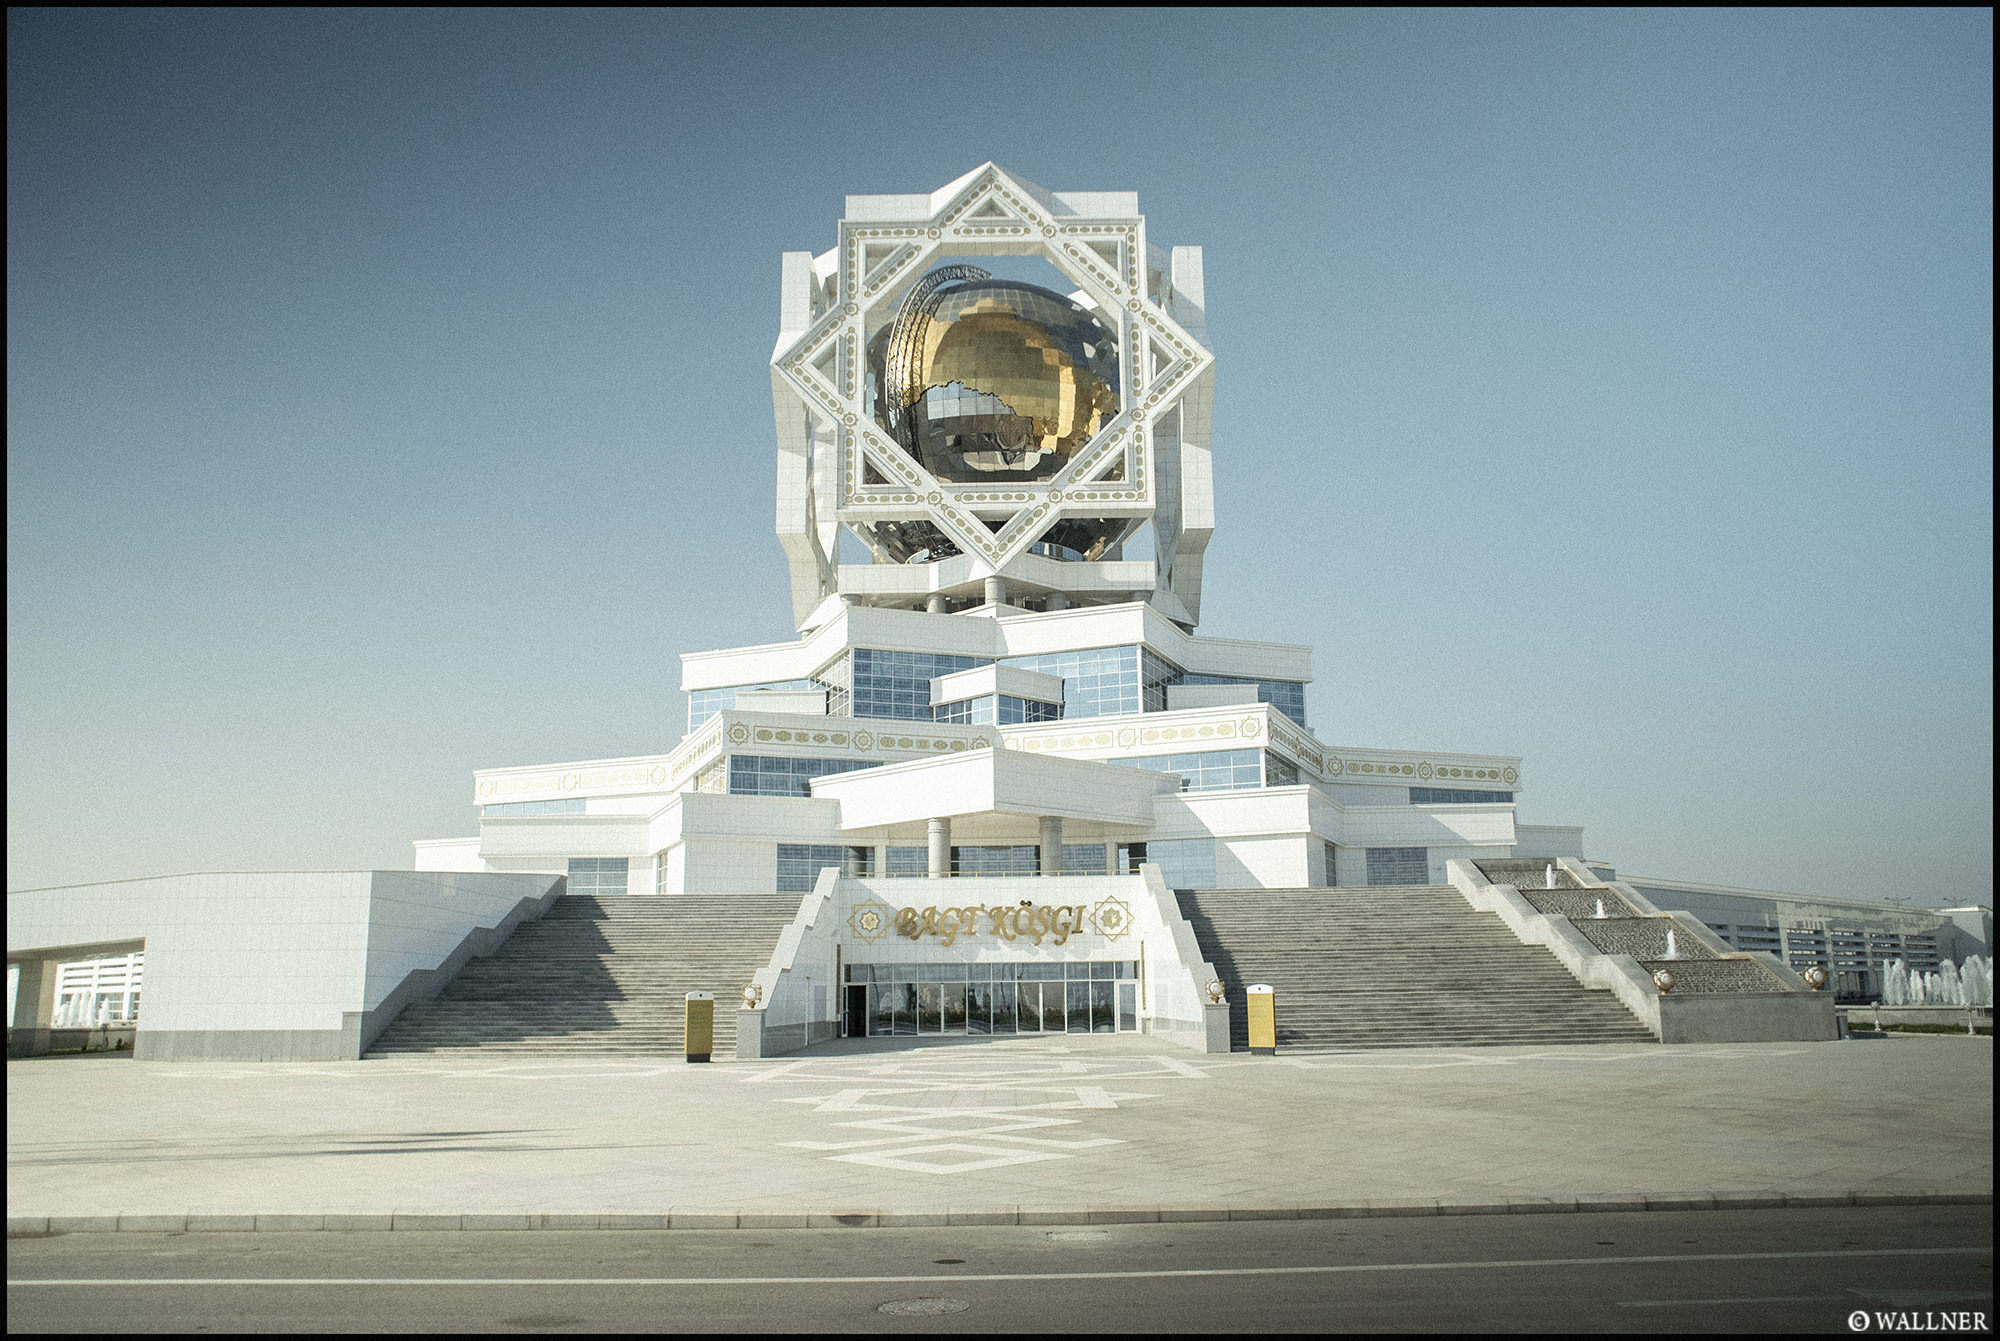 Digital Patrik Wallner Ashgabat Palace Of Happiness LOWQ 2000P